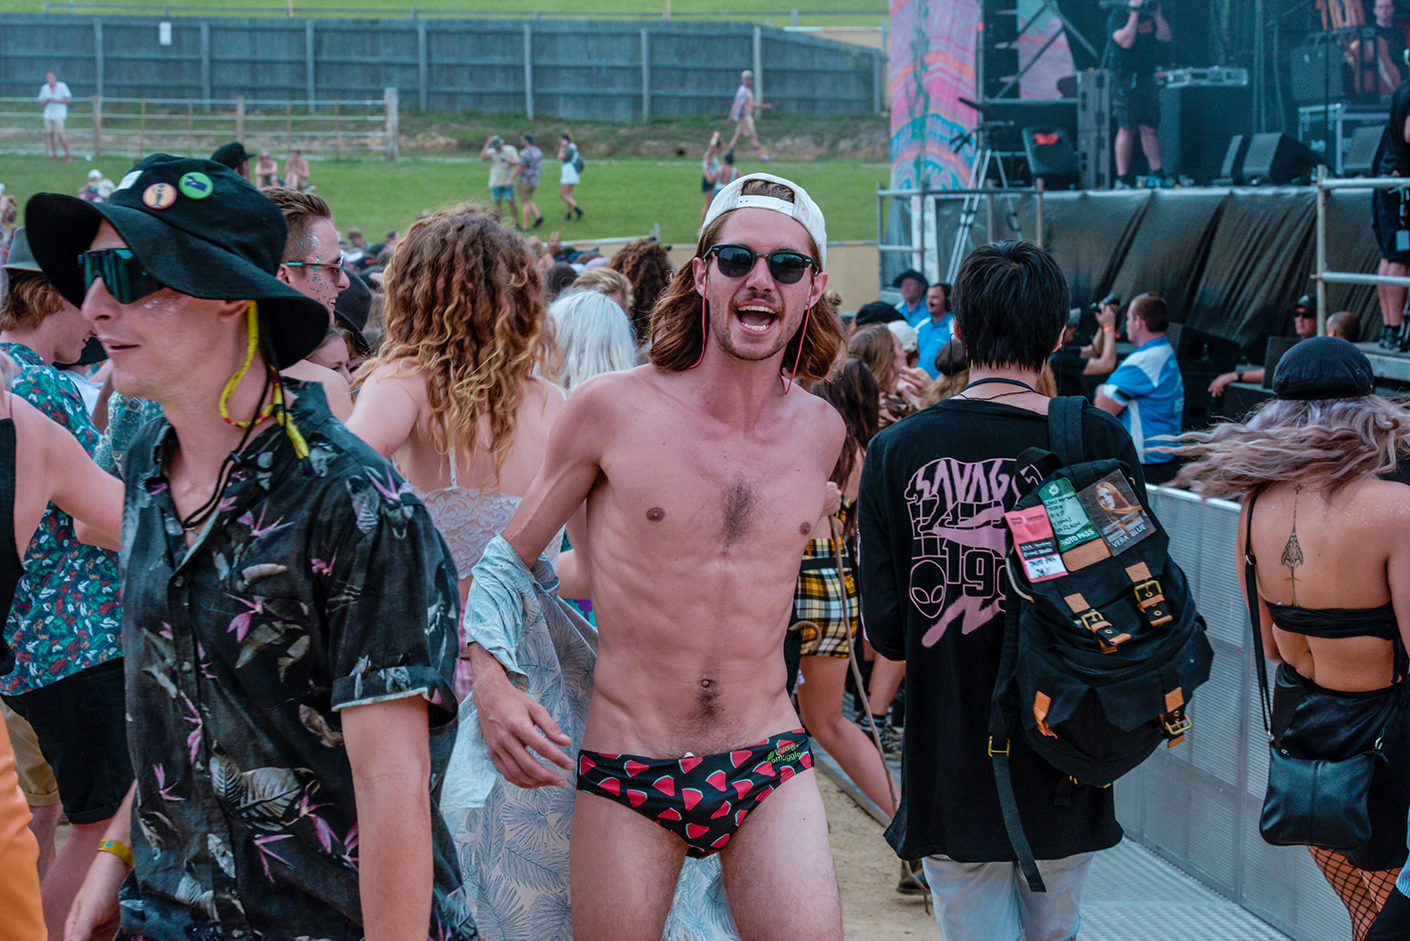 live review falls festival byron bay photo credit dominique berns blackwell savage thrills savagethrills 18